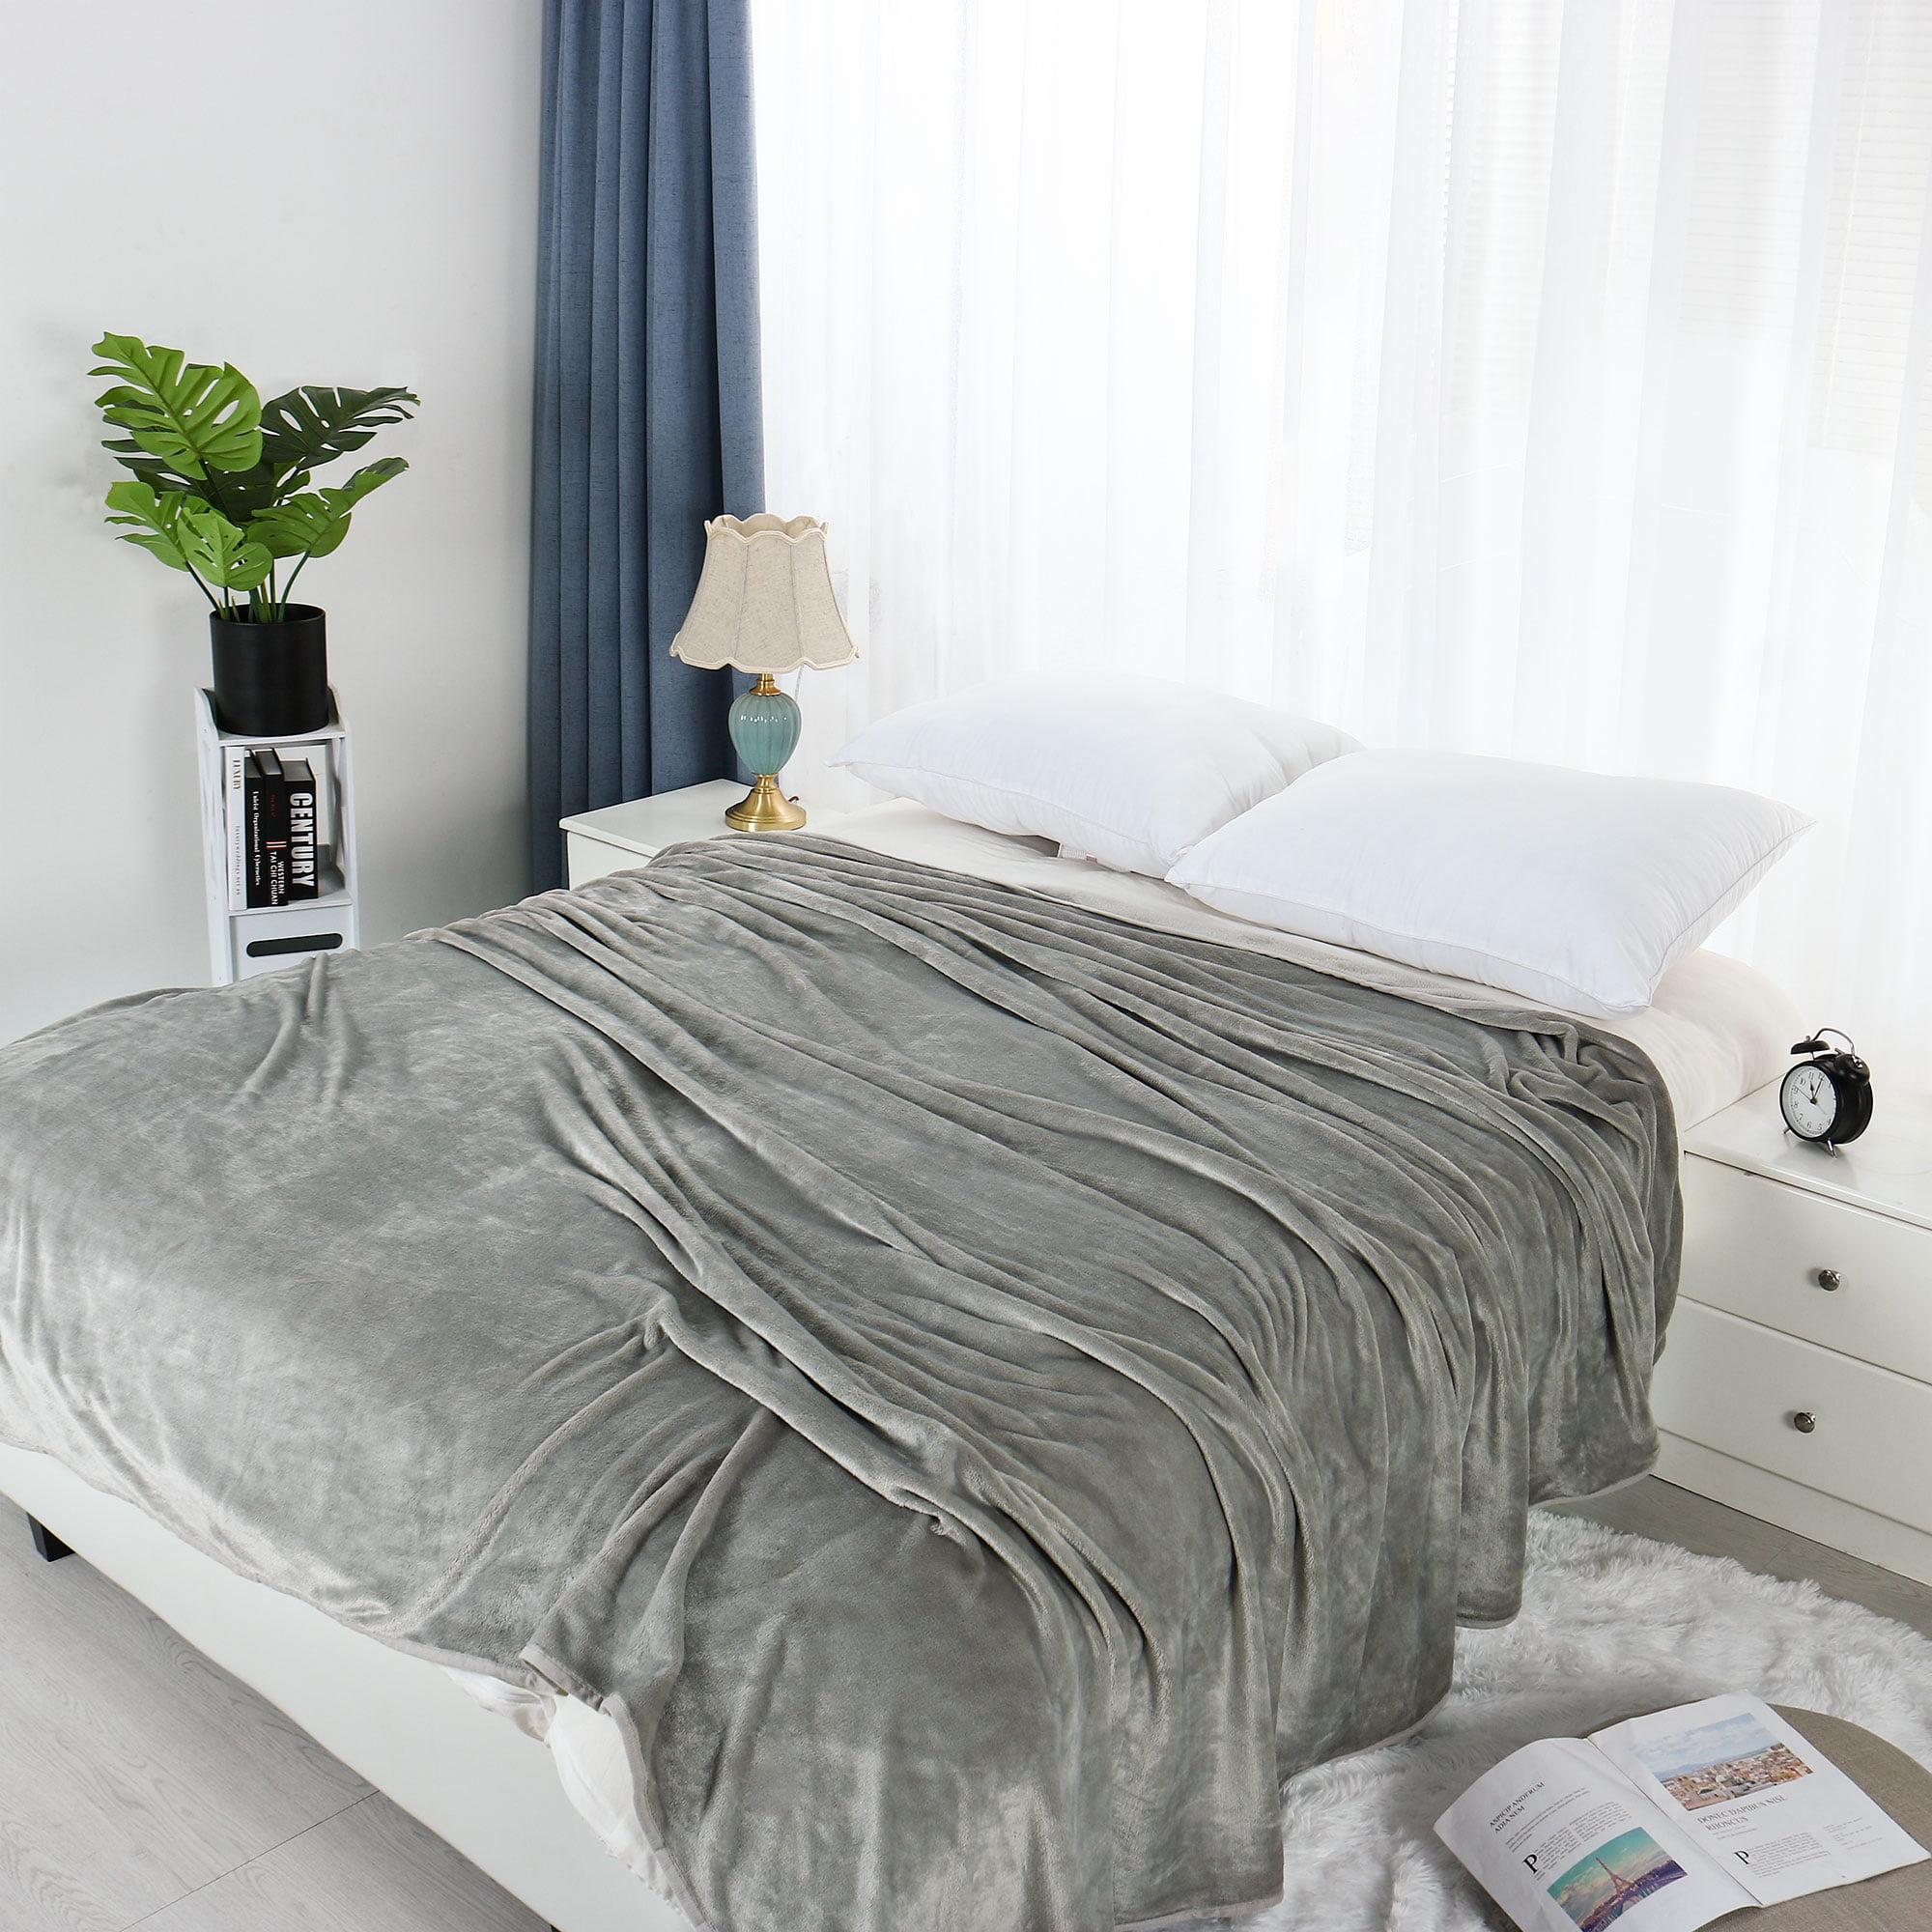 Soft Warm Solid Printed Grey Sofa Bed Micro Plush Fleece Twin Size Blanket Walmart Com Walmart Com